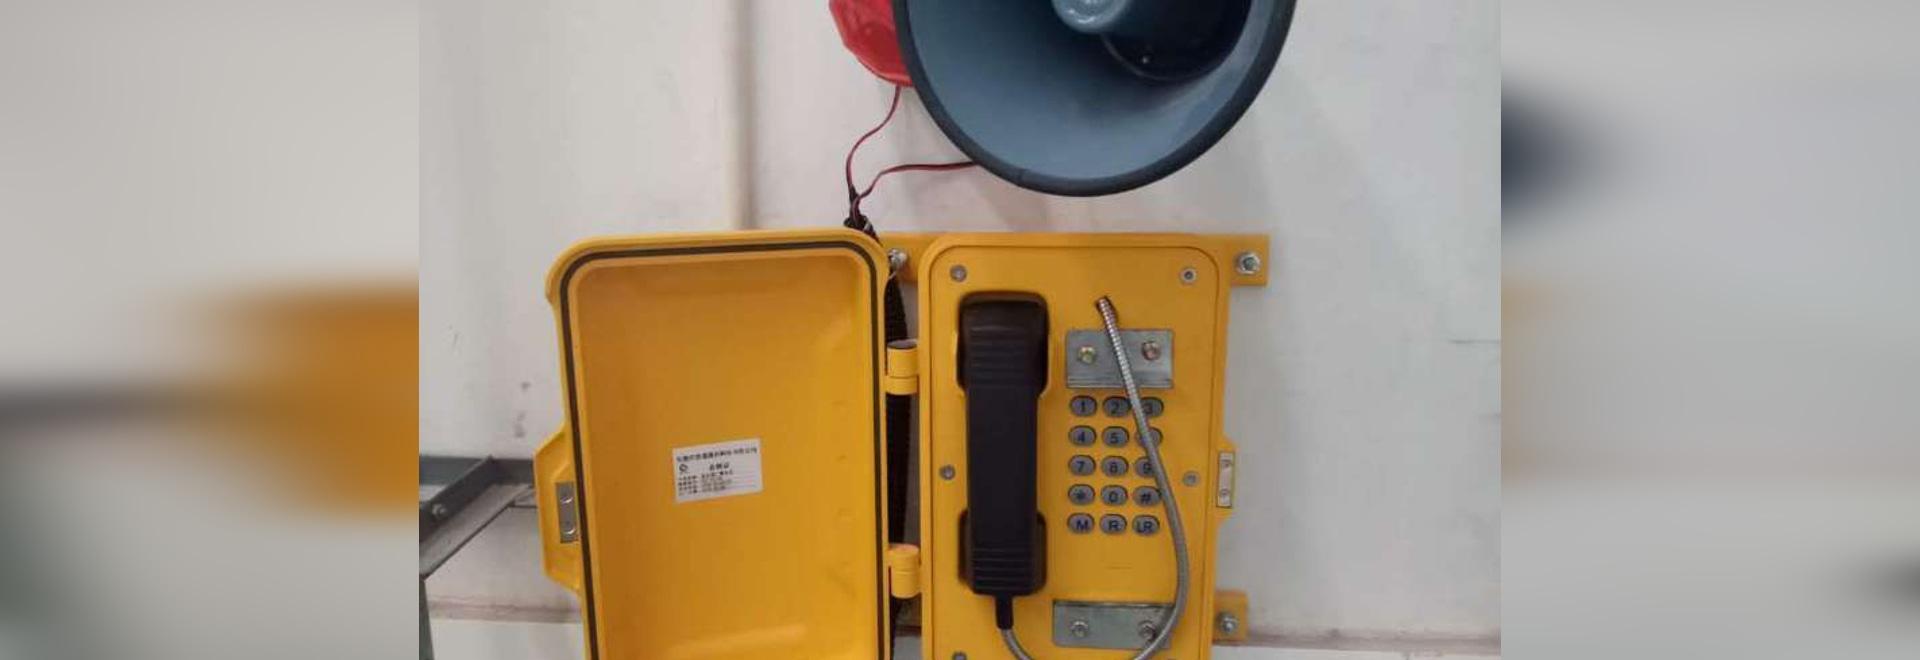 Industrial anti - noise loudspeaker broadcast intercom system